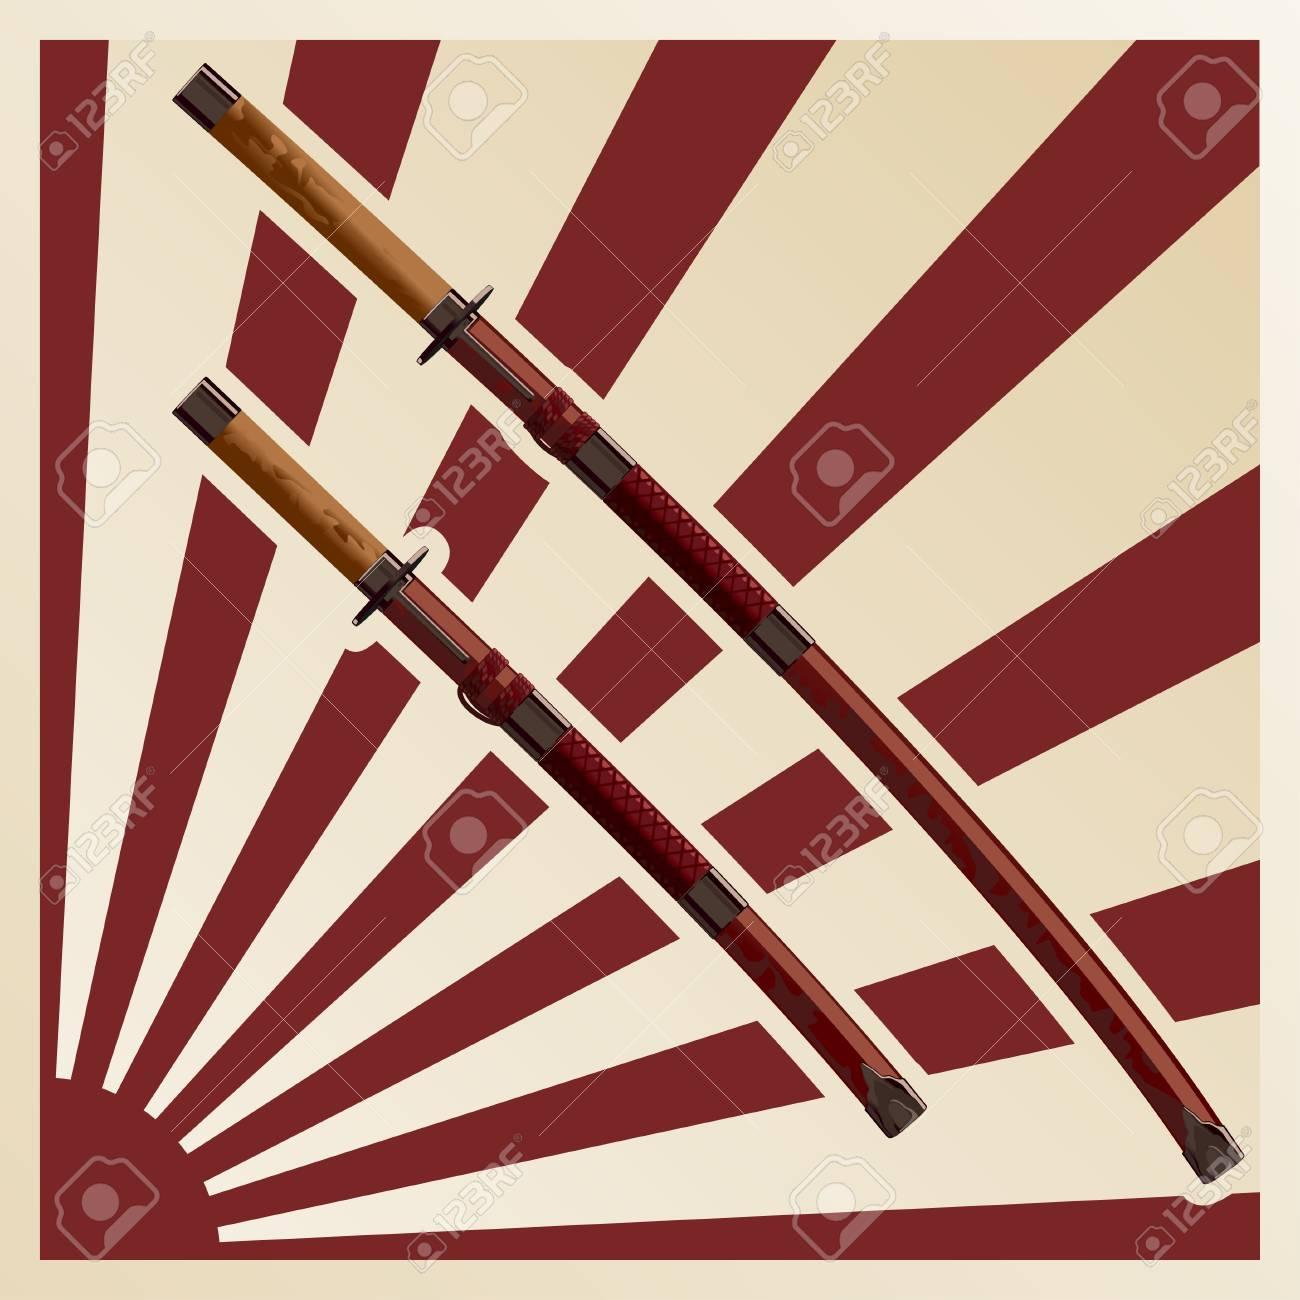 samurai swords in a sheath against the background of the sun - 115033854